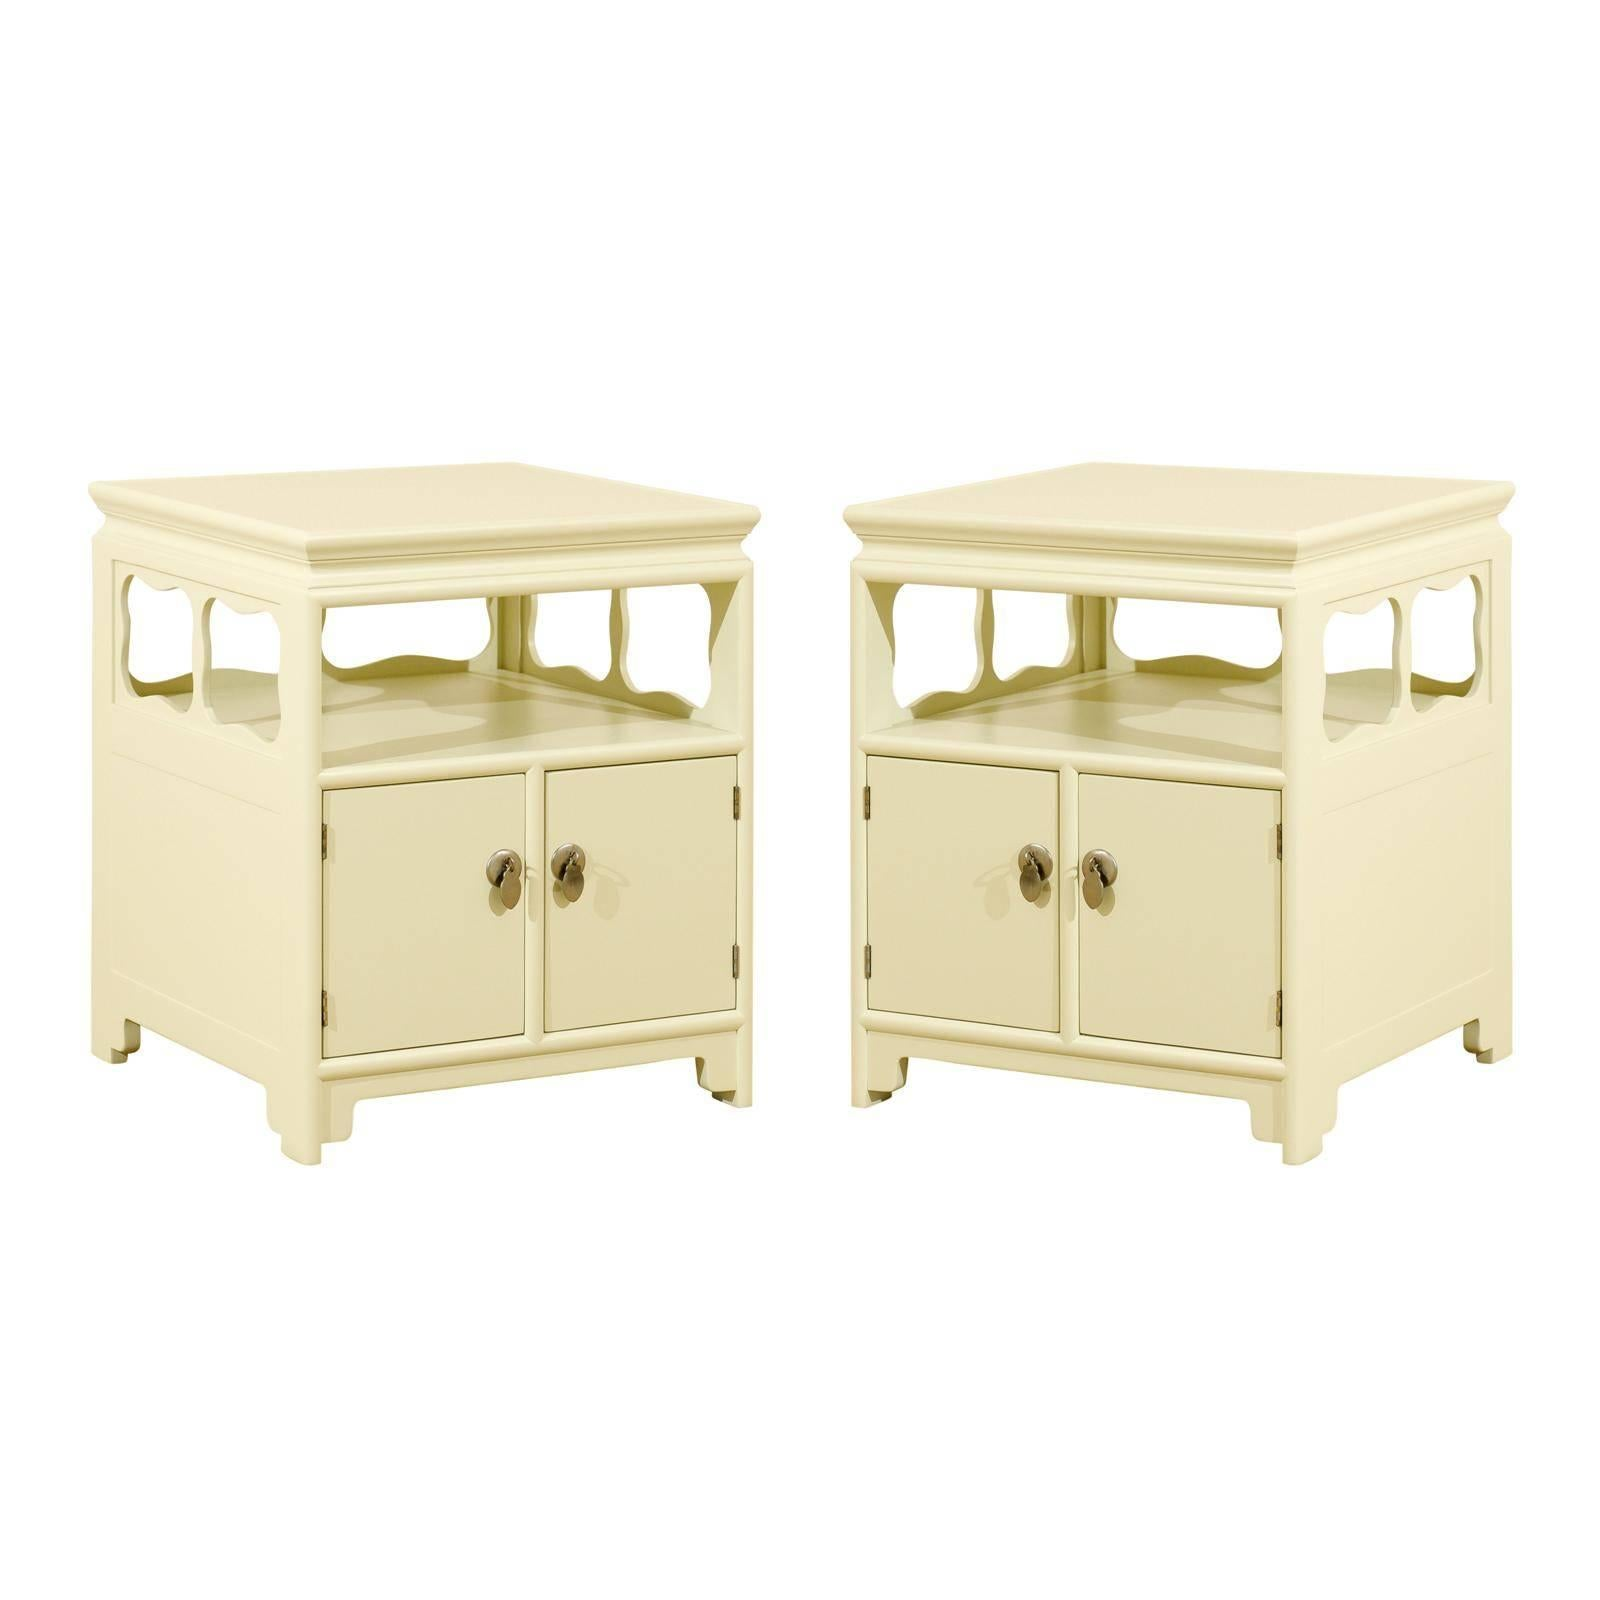 Restored Pair of Vintage End Tables or Nightstands by Baker